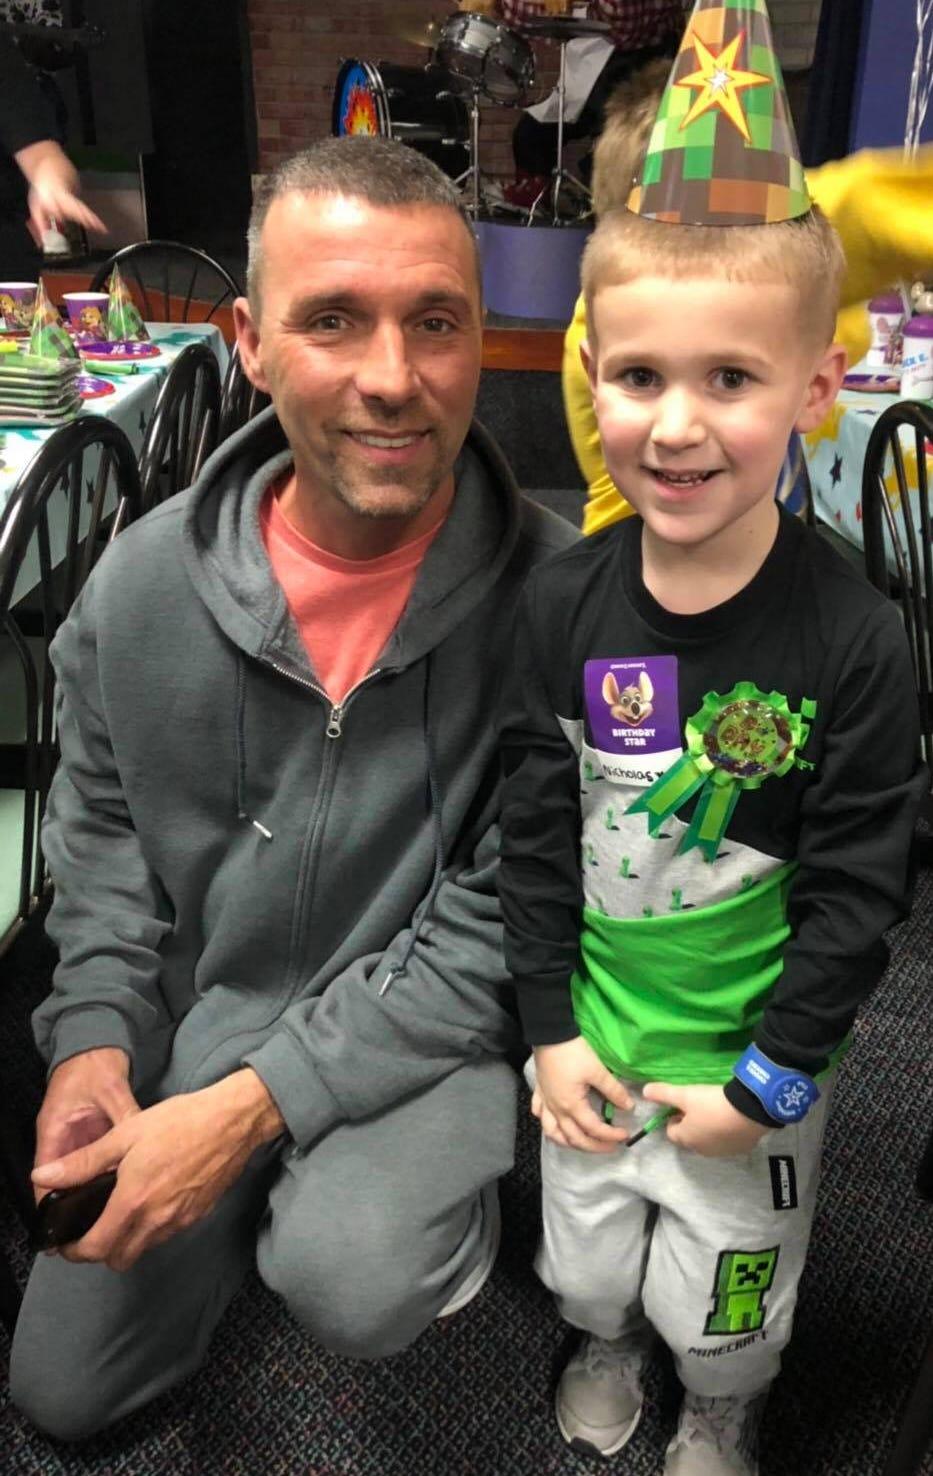 Daniel Clark, with his 5-year-old son Nicholas Clark.